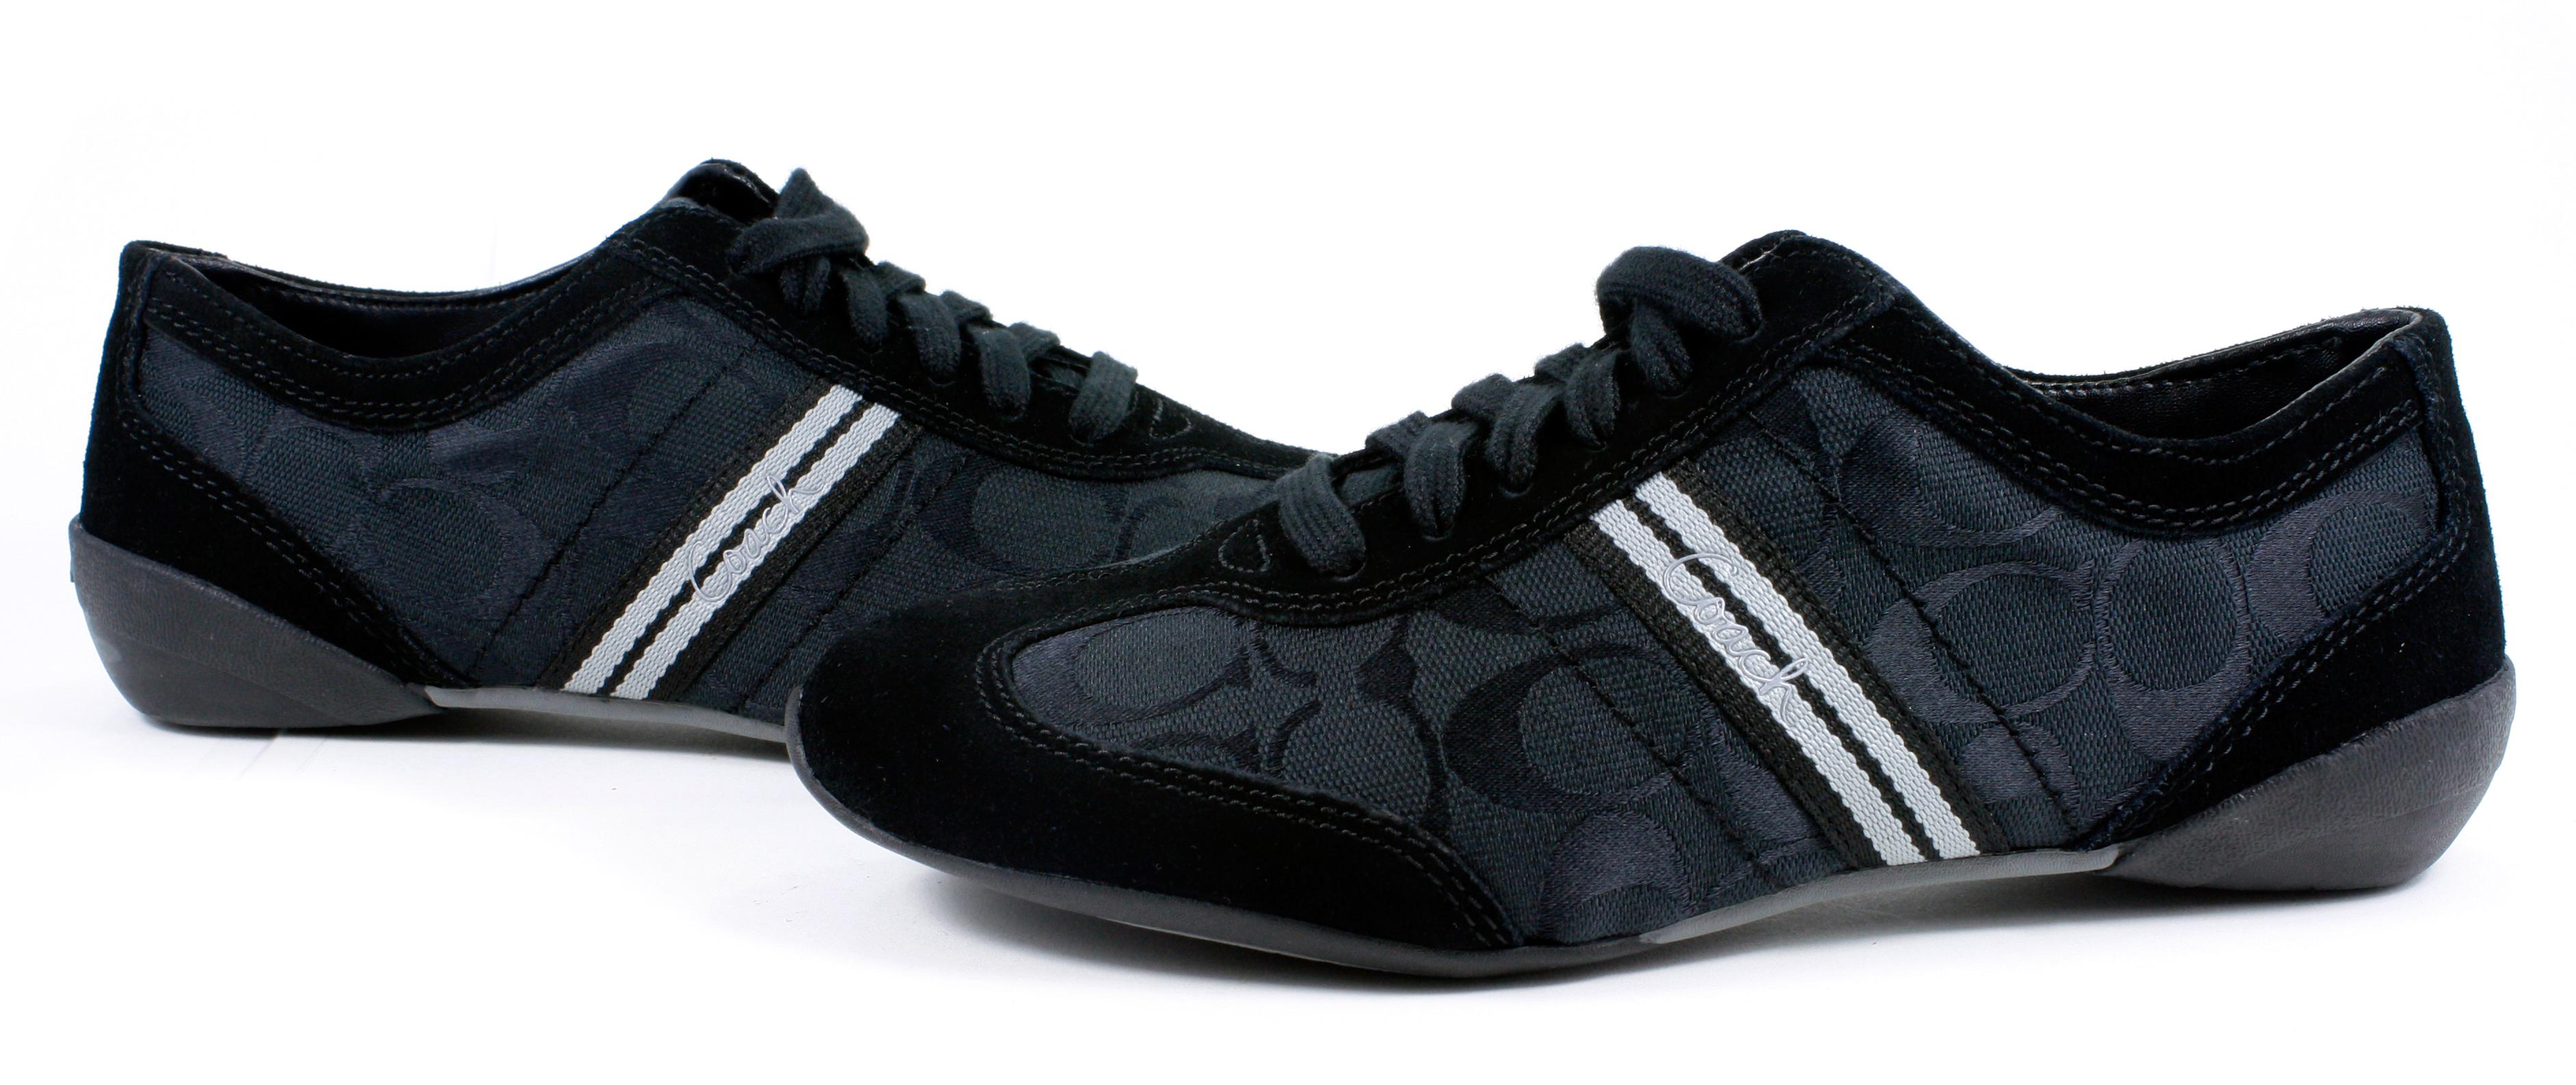 coach signature beyla 12cm black logo sneakers tennis